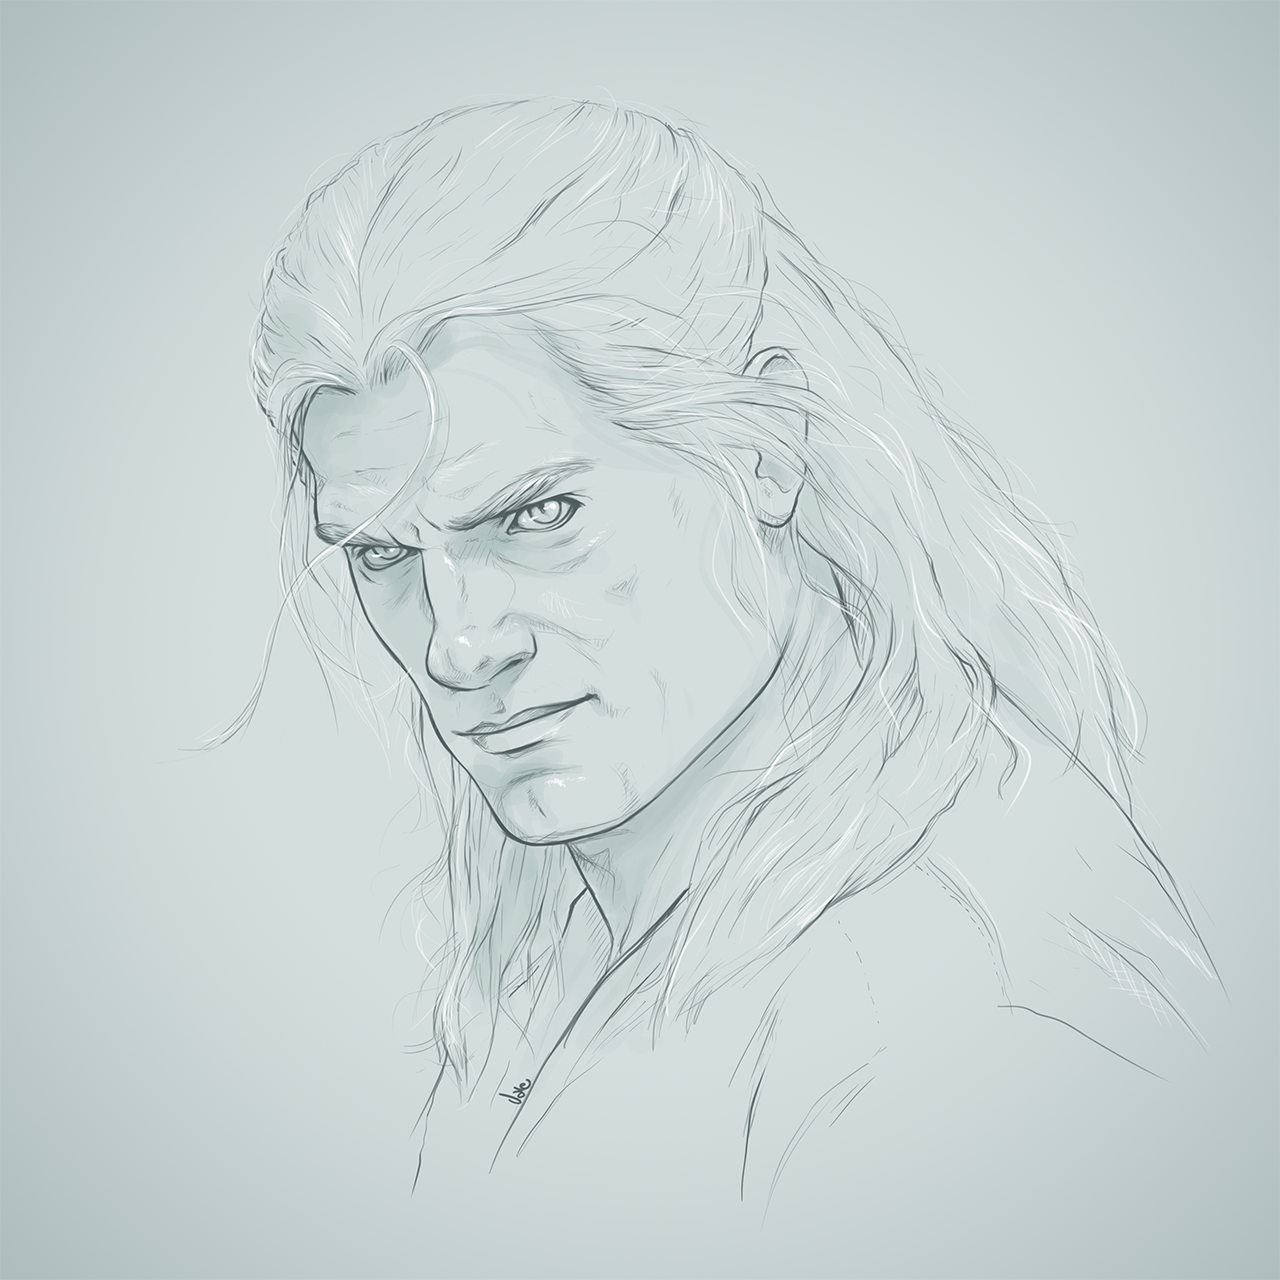 Geralt Study